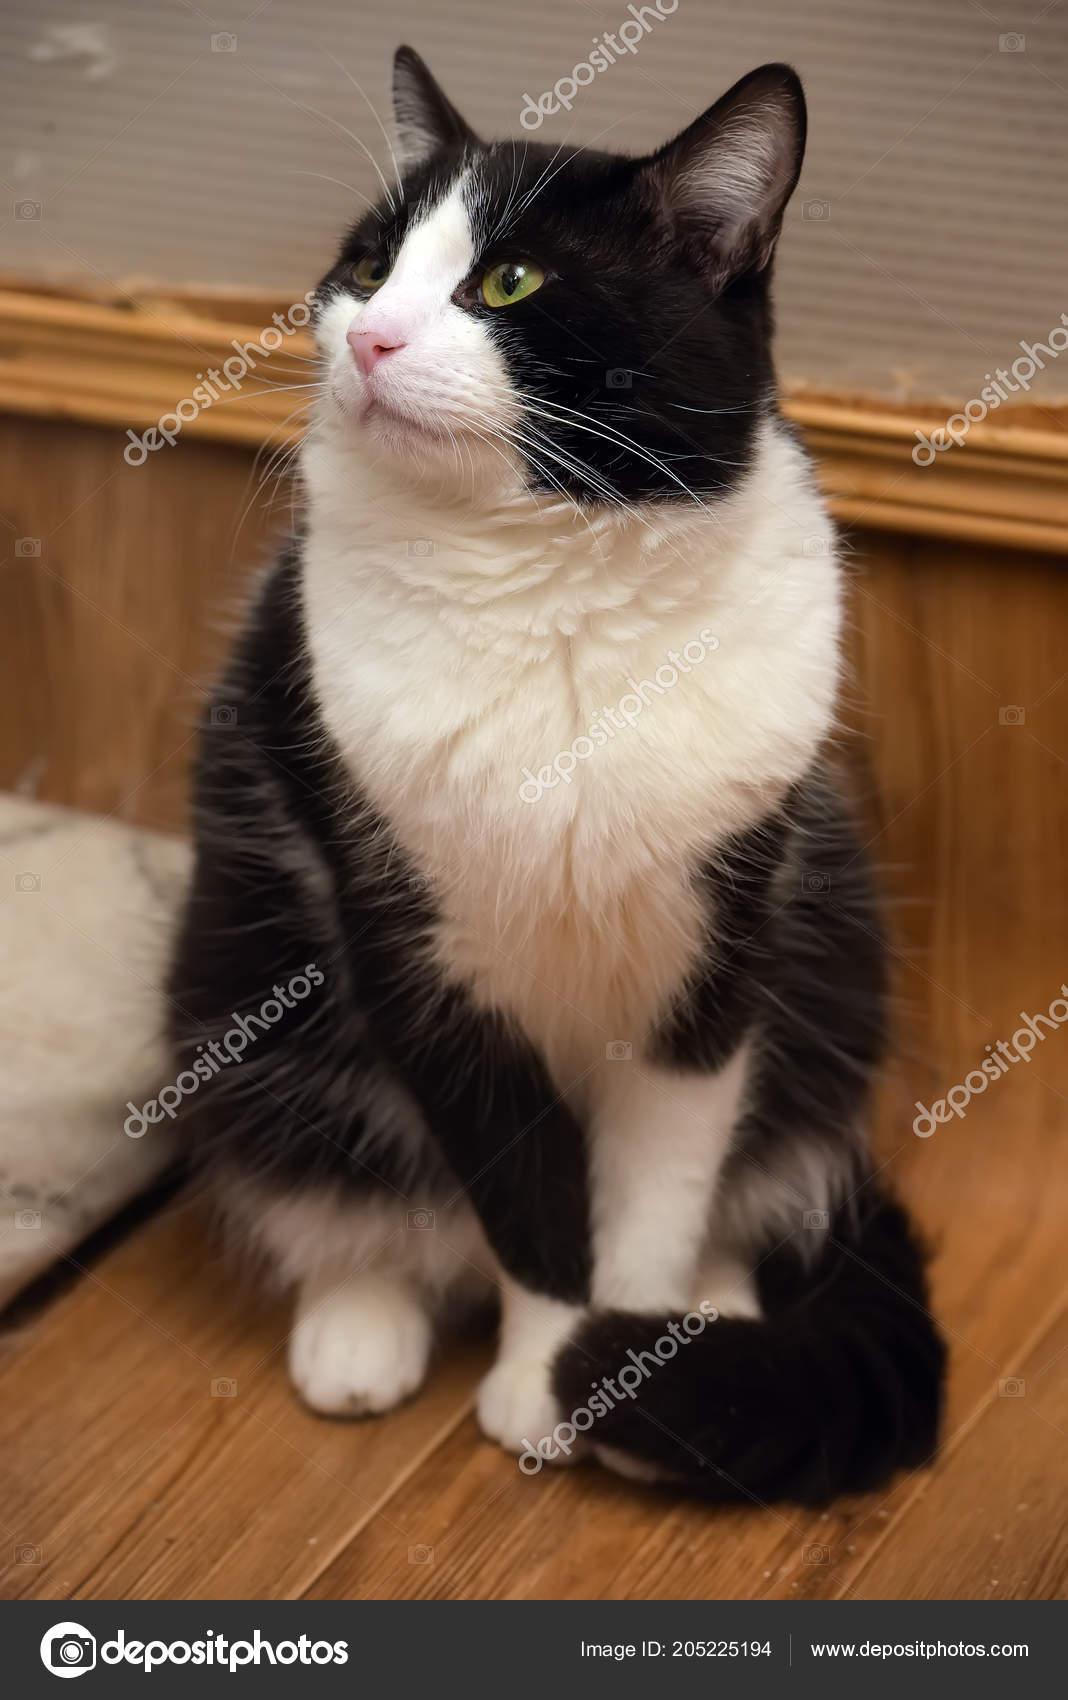 Gatto Bianco Nero Pelo Corto Riparo Foto Stock Evdoha 205225194